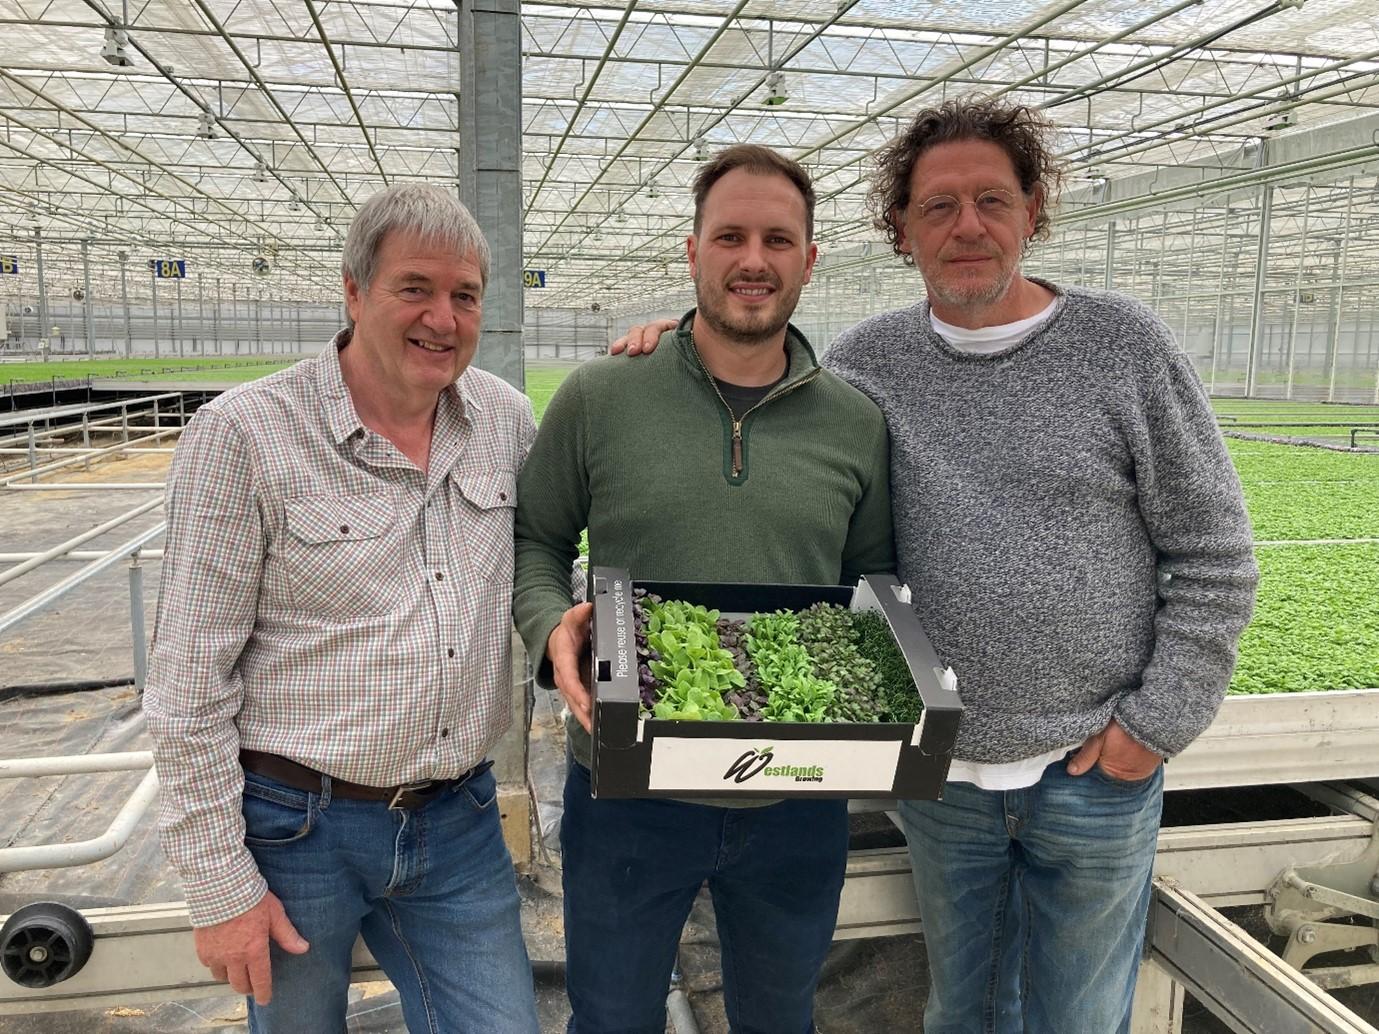 Ken Mortimer, Heritage Fine Foods, William Boers, Westlands and Marco Pierre White